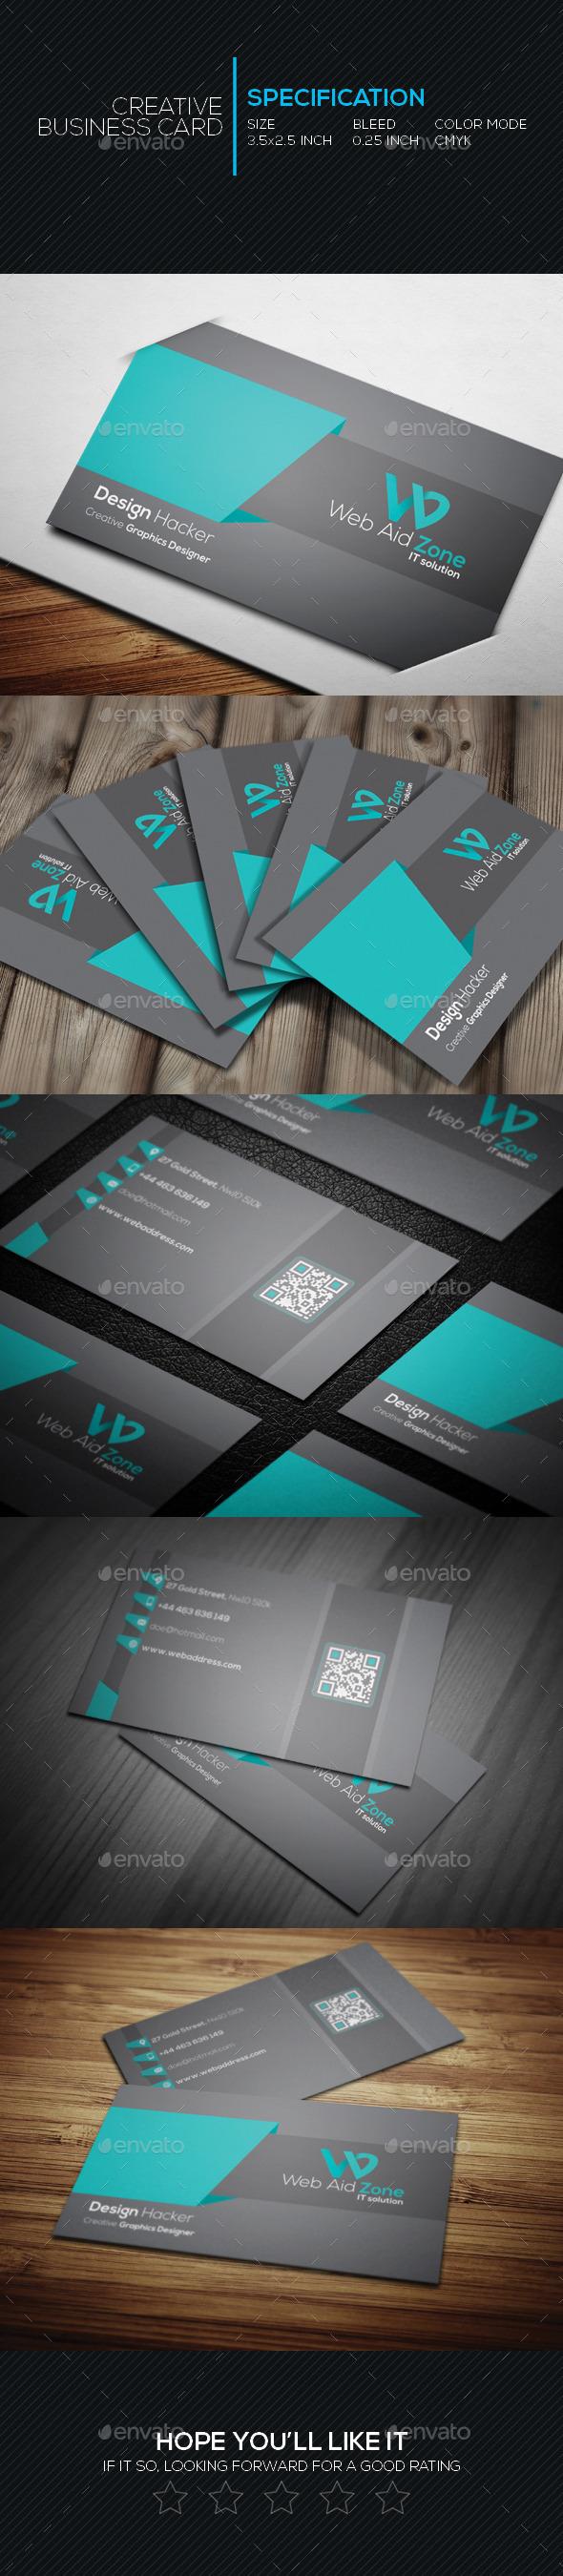 GraphicRiver Creative Business Card SL 11 10185331